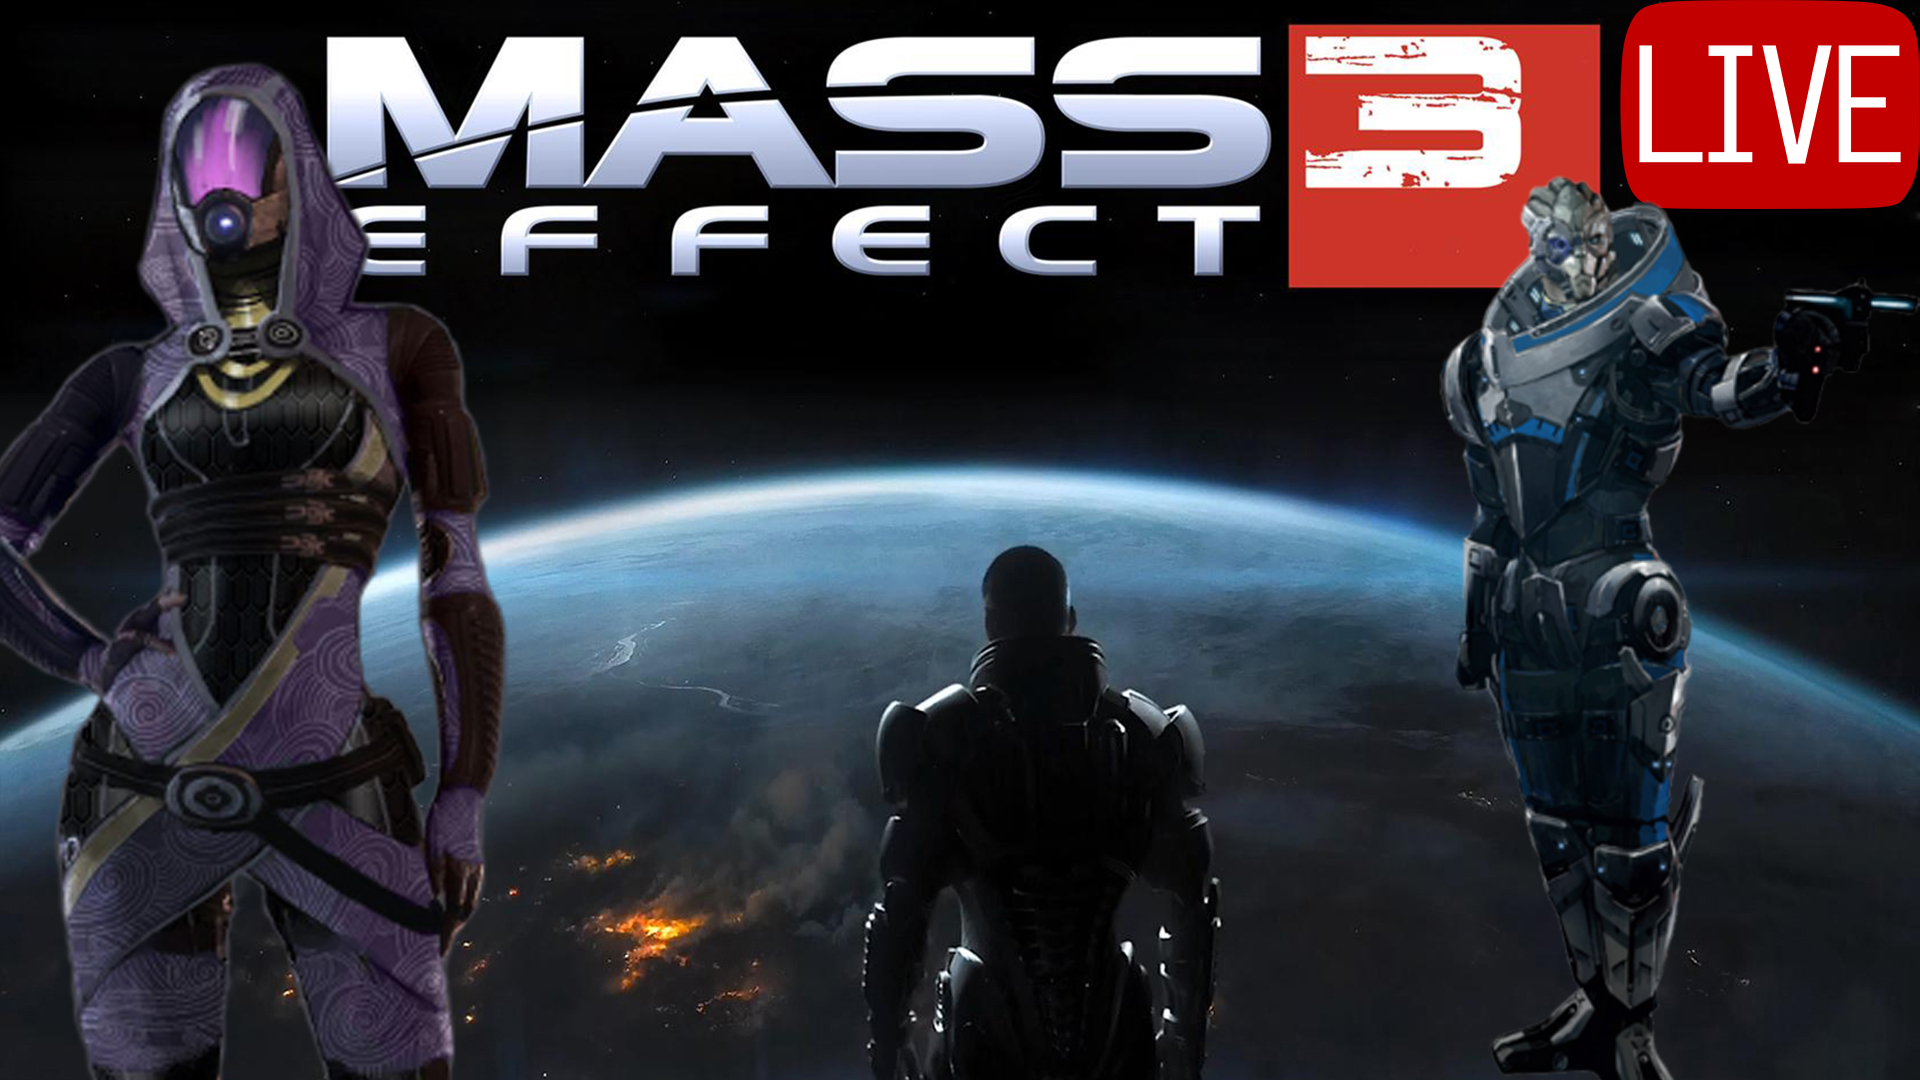 Mass Effect 3 Thumbnail Live Tali & Garrus